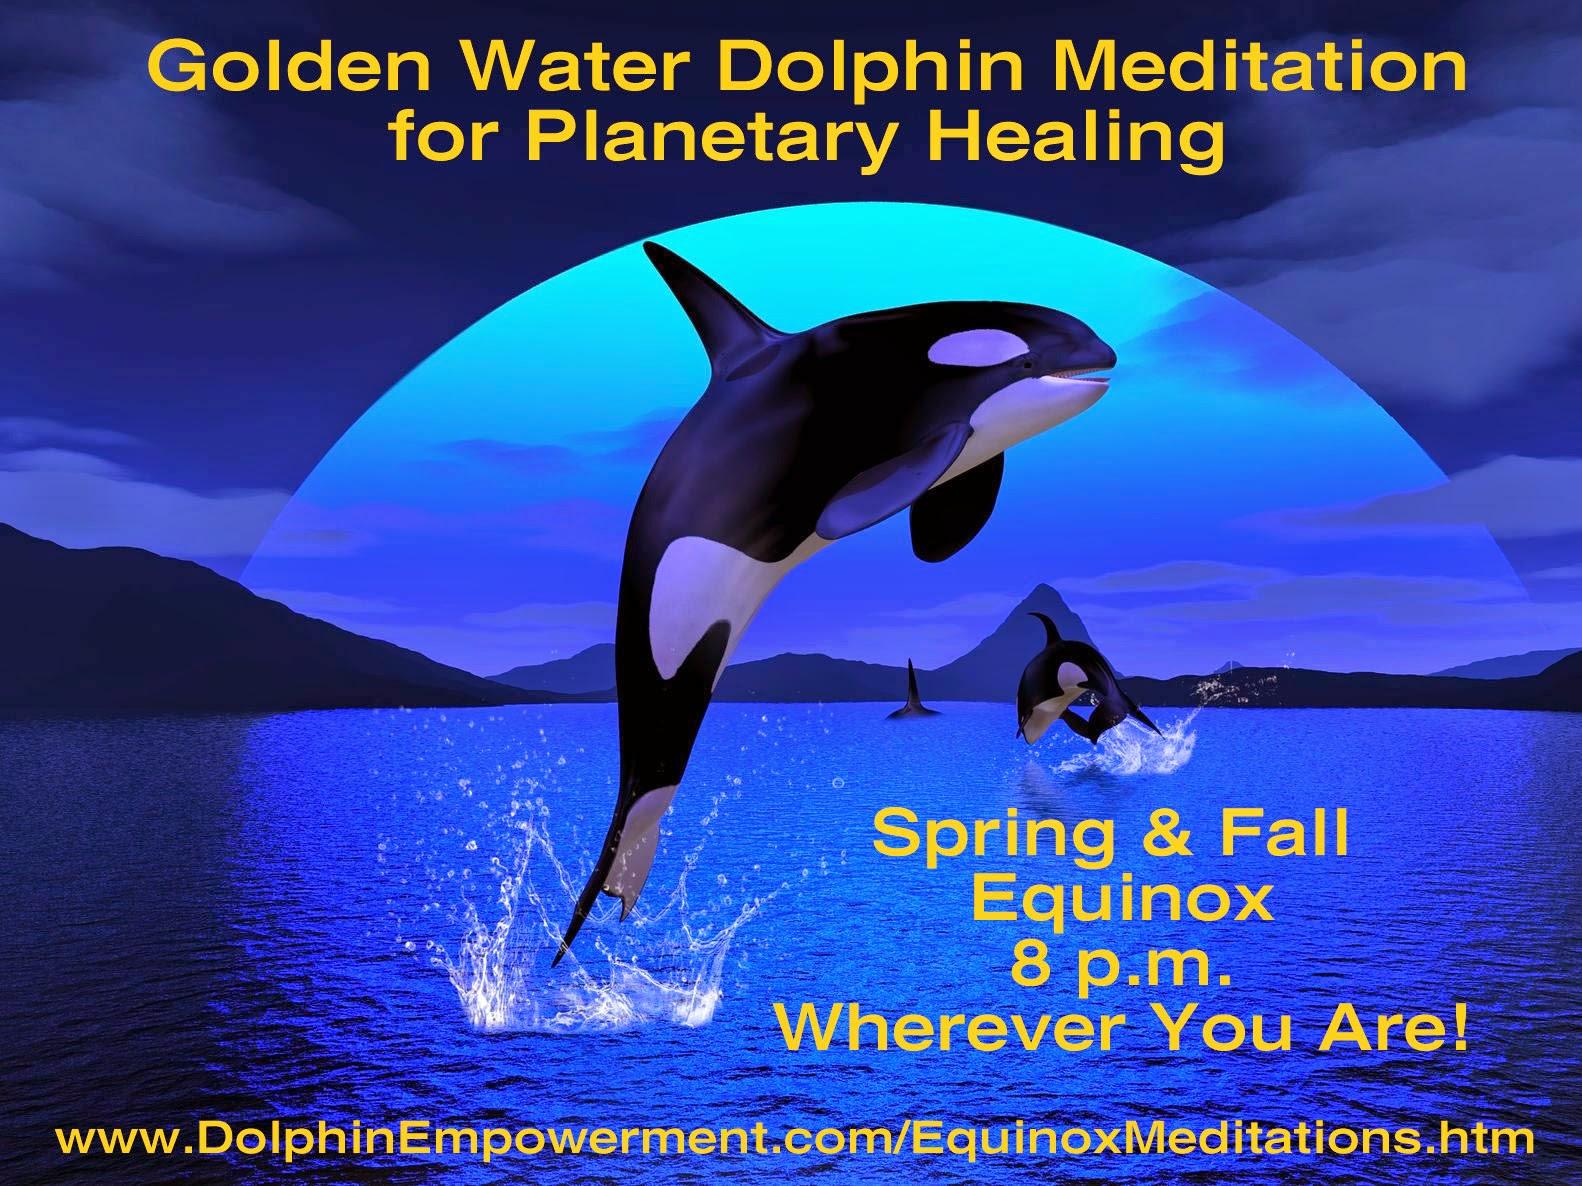 http://dolphinempowerment.com/EquinoxMeditations.htm